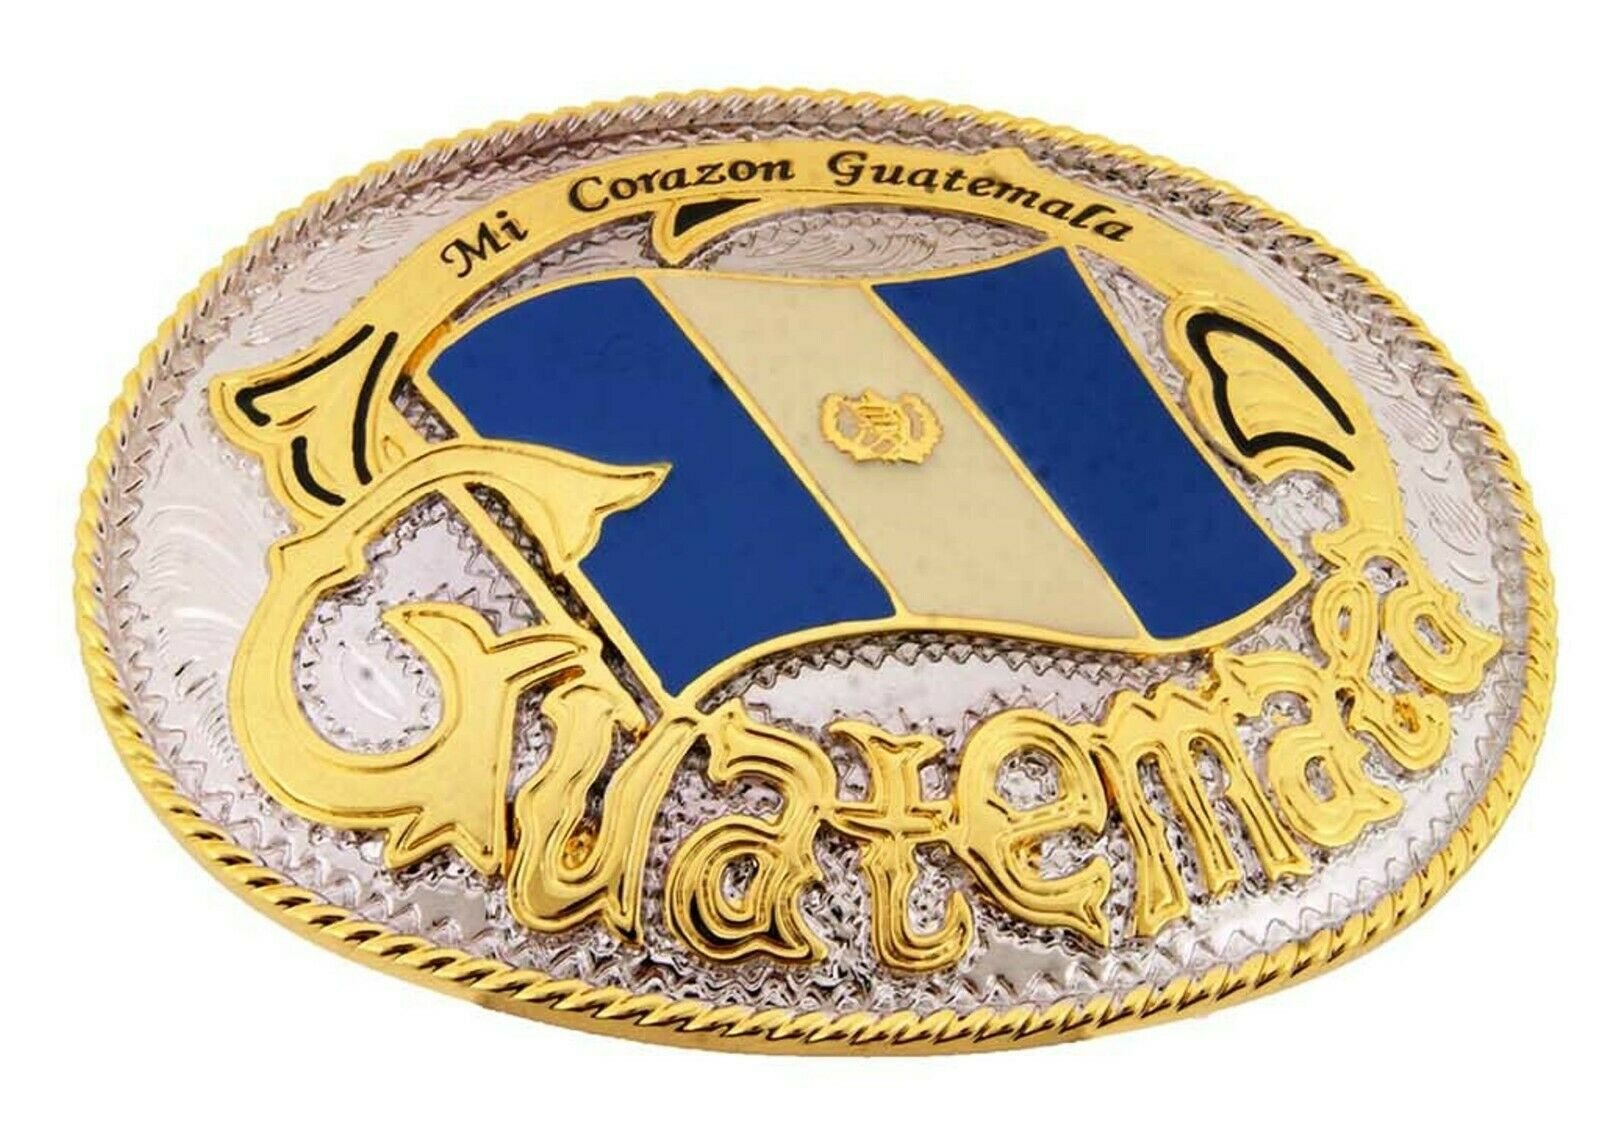 Guatemala Gürtelschnalle Groß Neu Flagge Country Wunderland Chapines Guatamalan